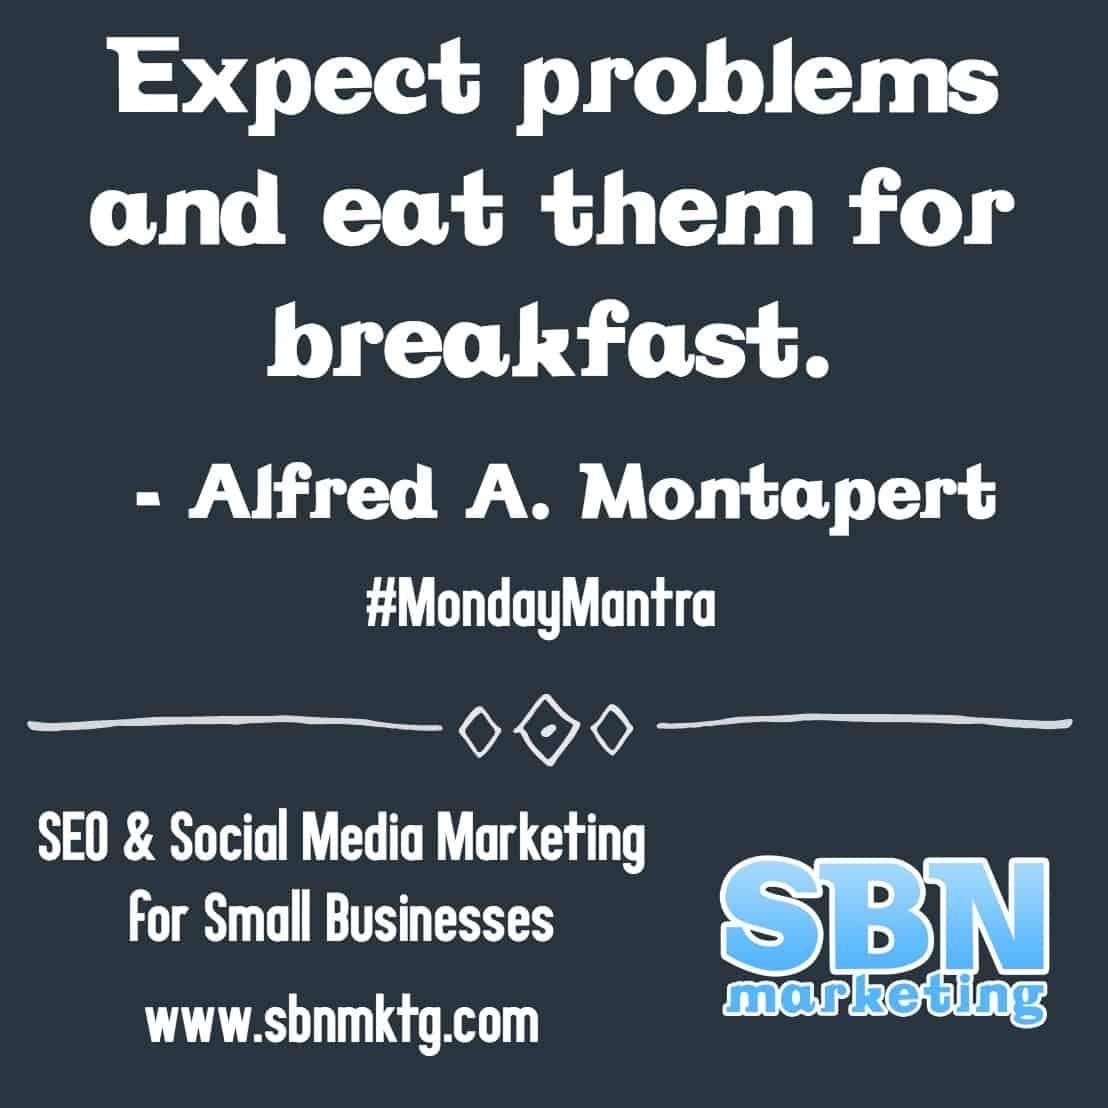 Monday Mantras by SEO & Social Media Maven Stephanie Nelson of SBN Marketing